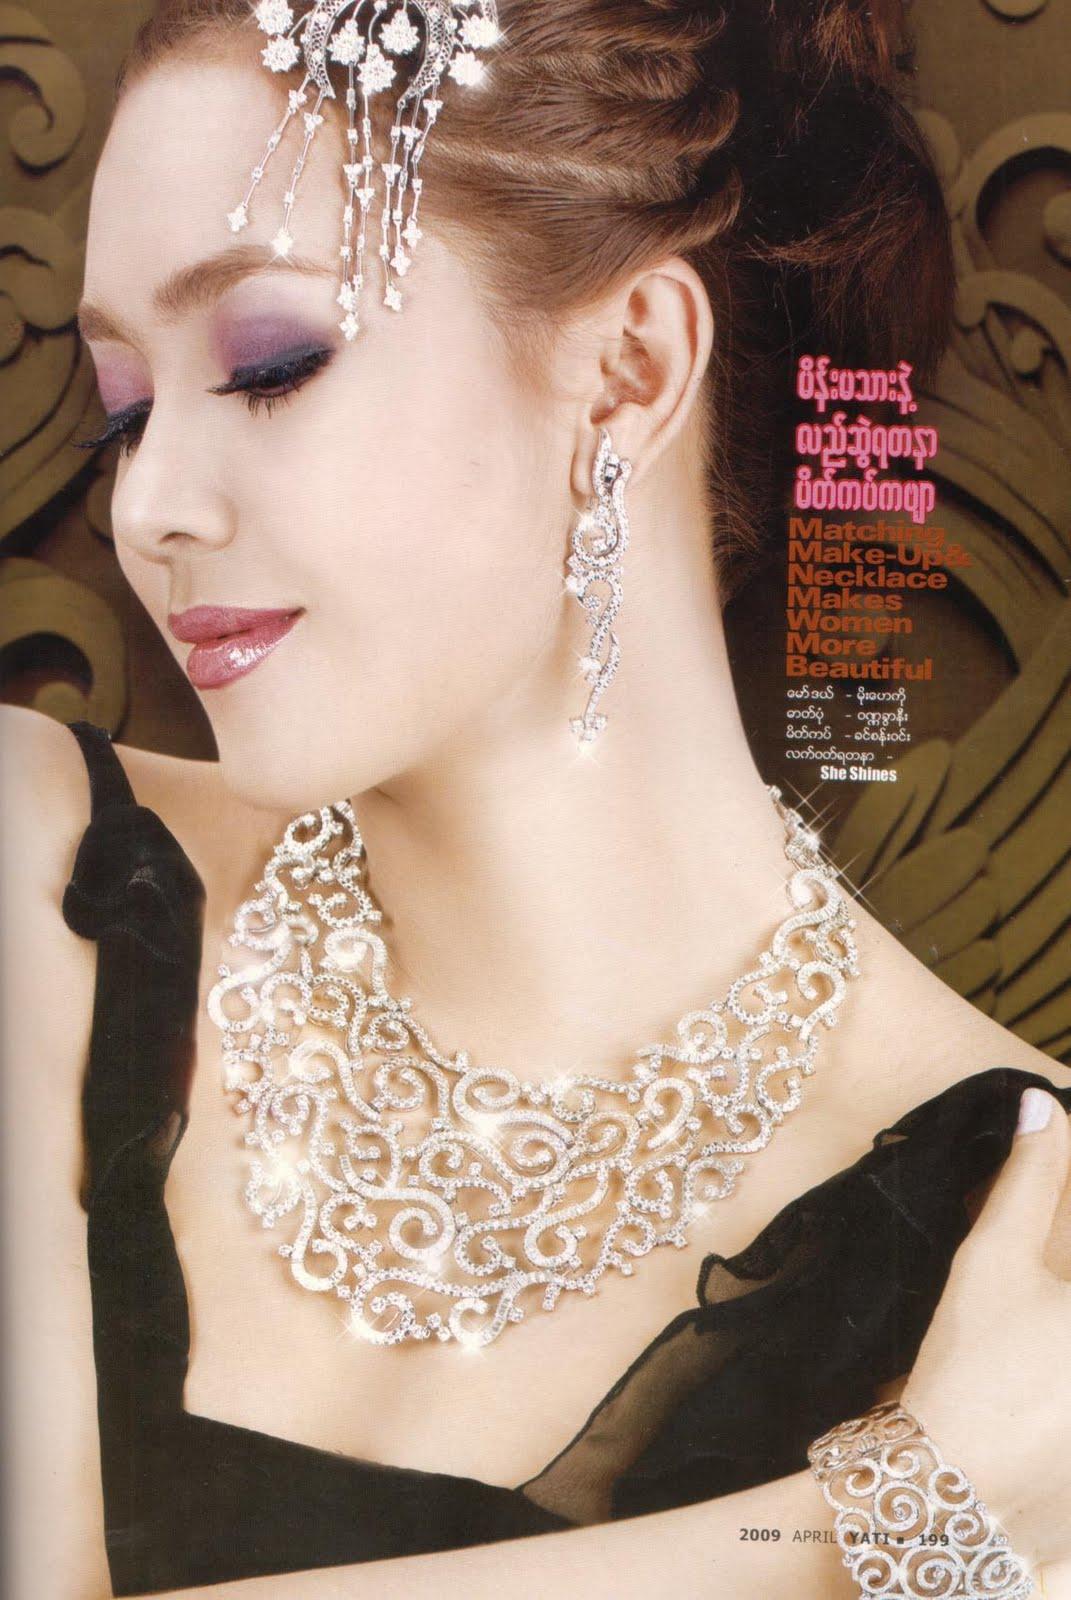 Myanmar Sexy Girls Myanmar Celebrities Vs Jewelry-8779